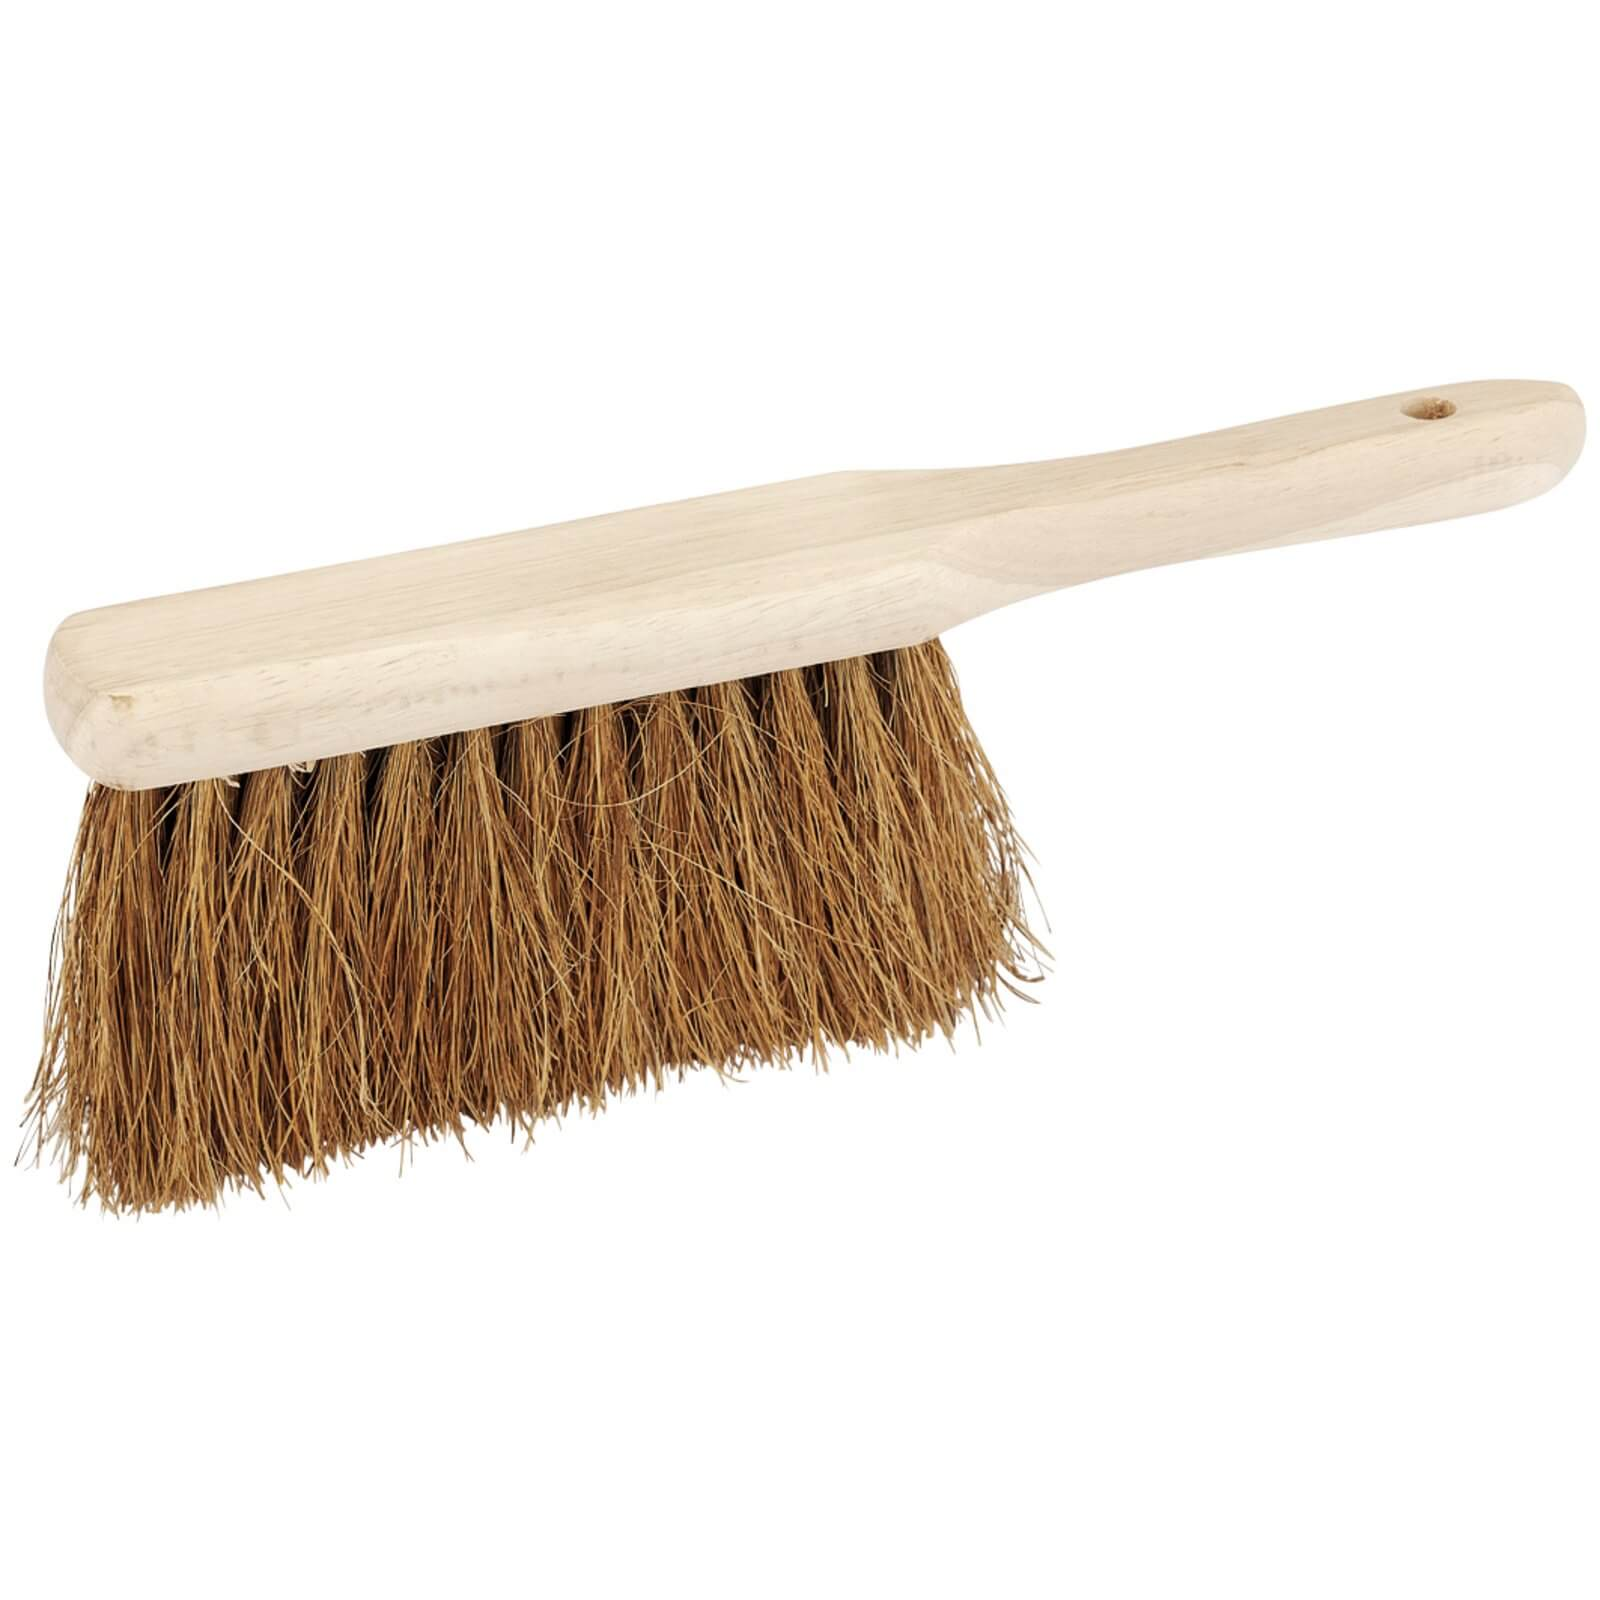 Image of Draper Soft Coco Hand Brush